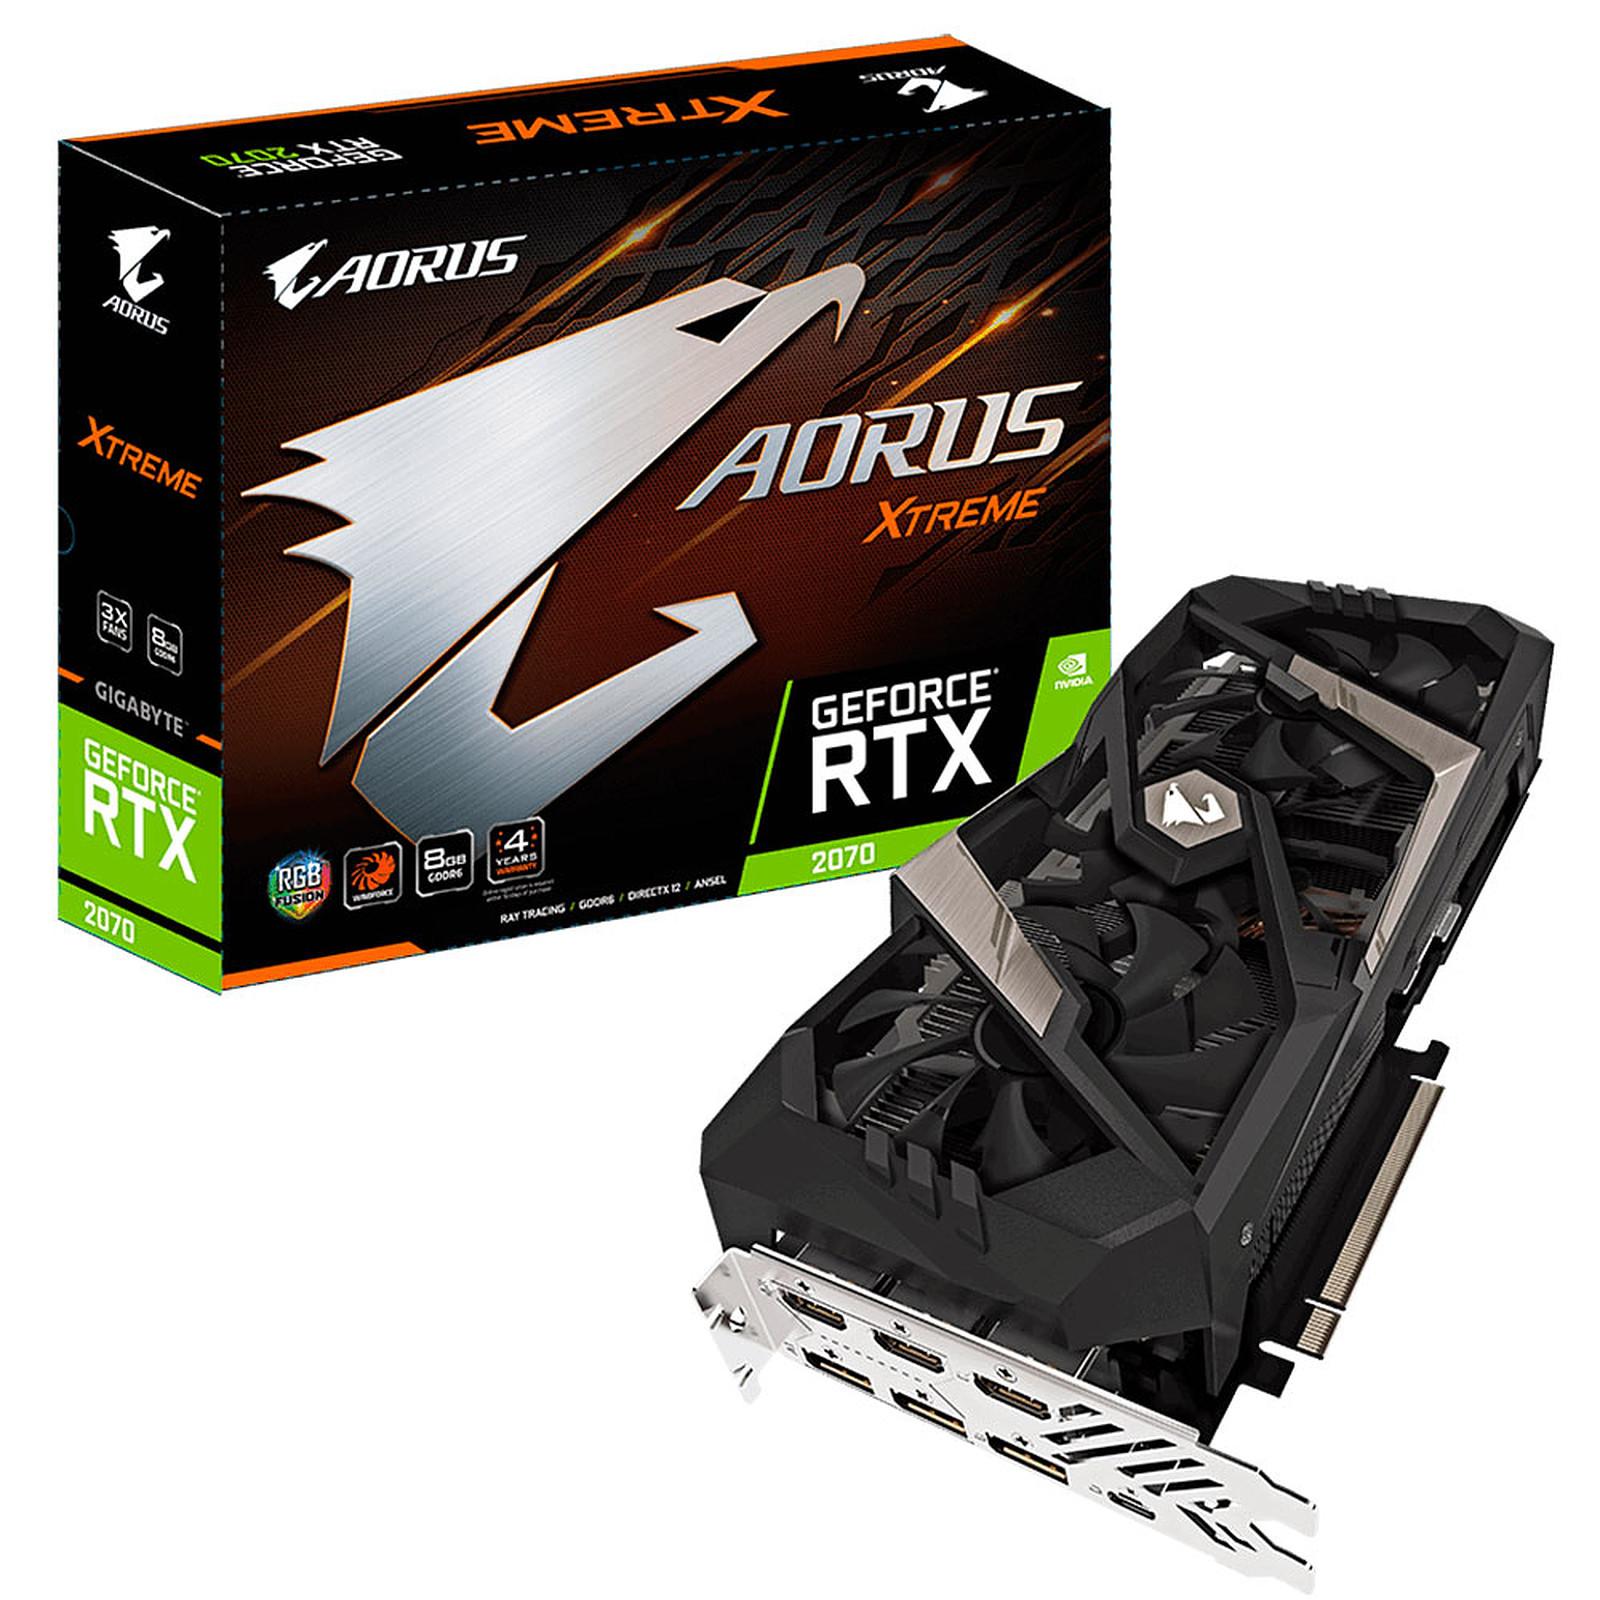 Gigabyte AORUS GeForce RTX 2070 XTREME 8G